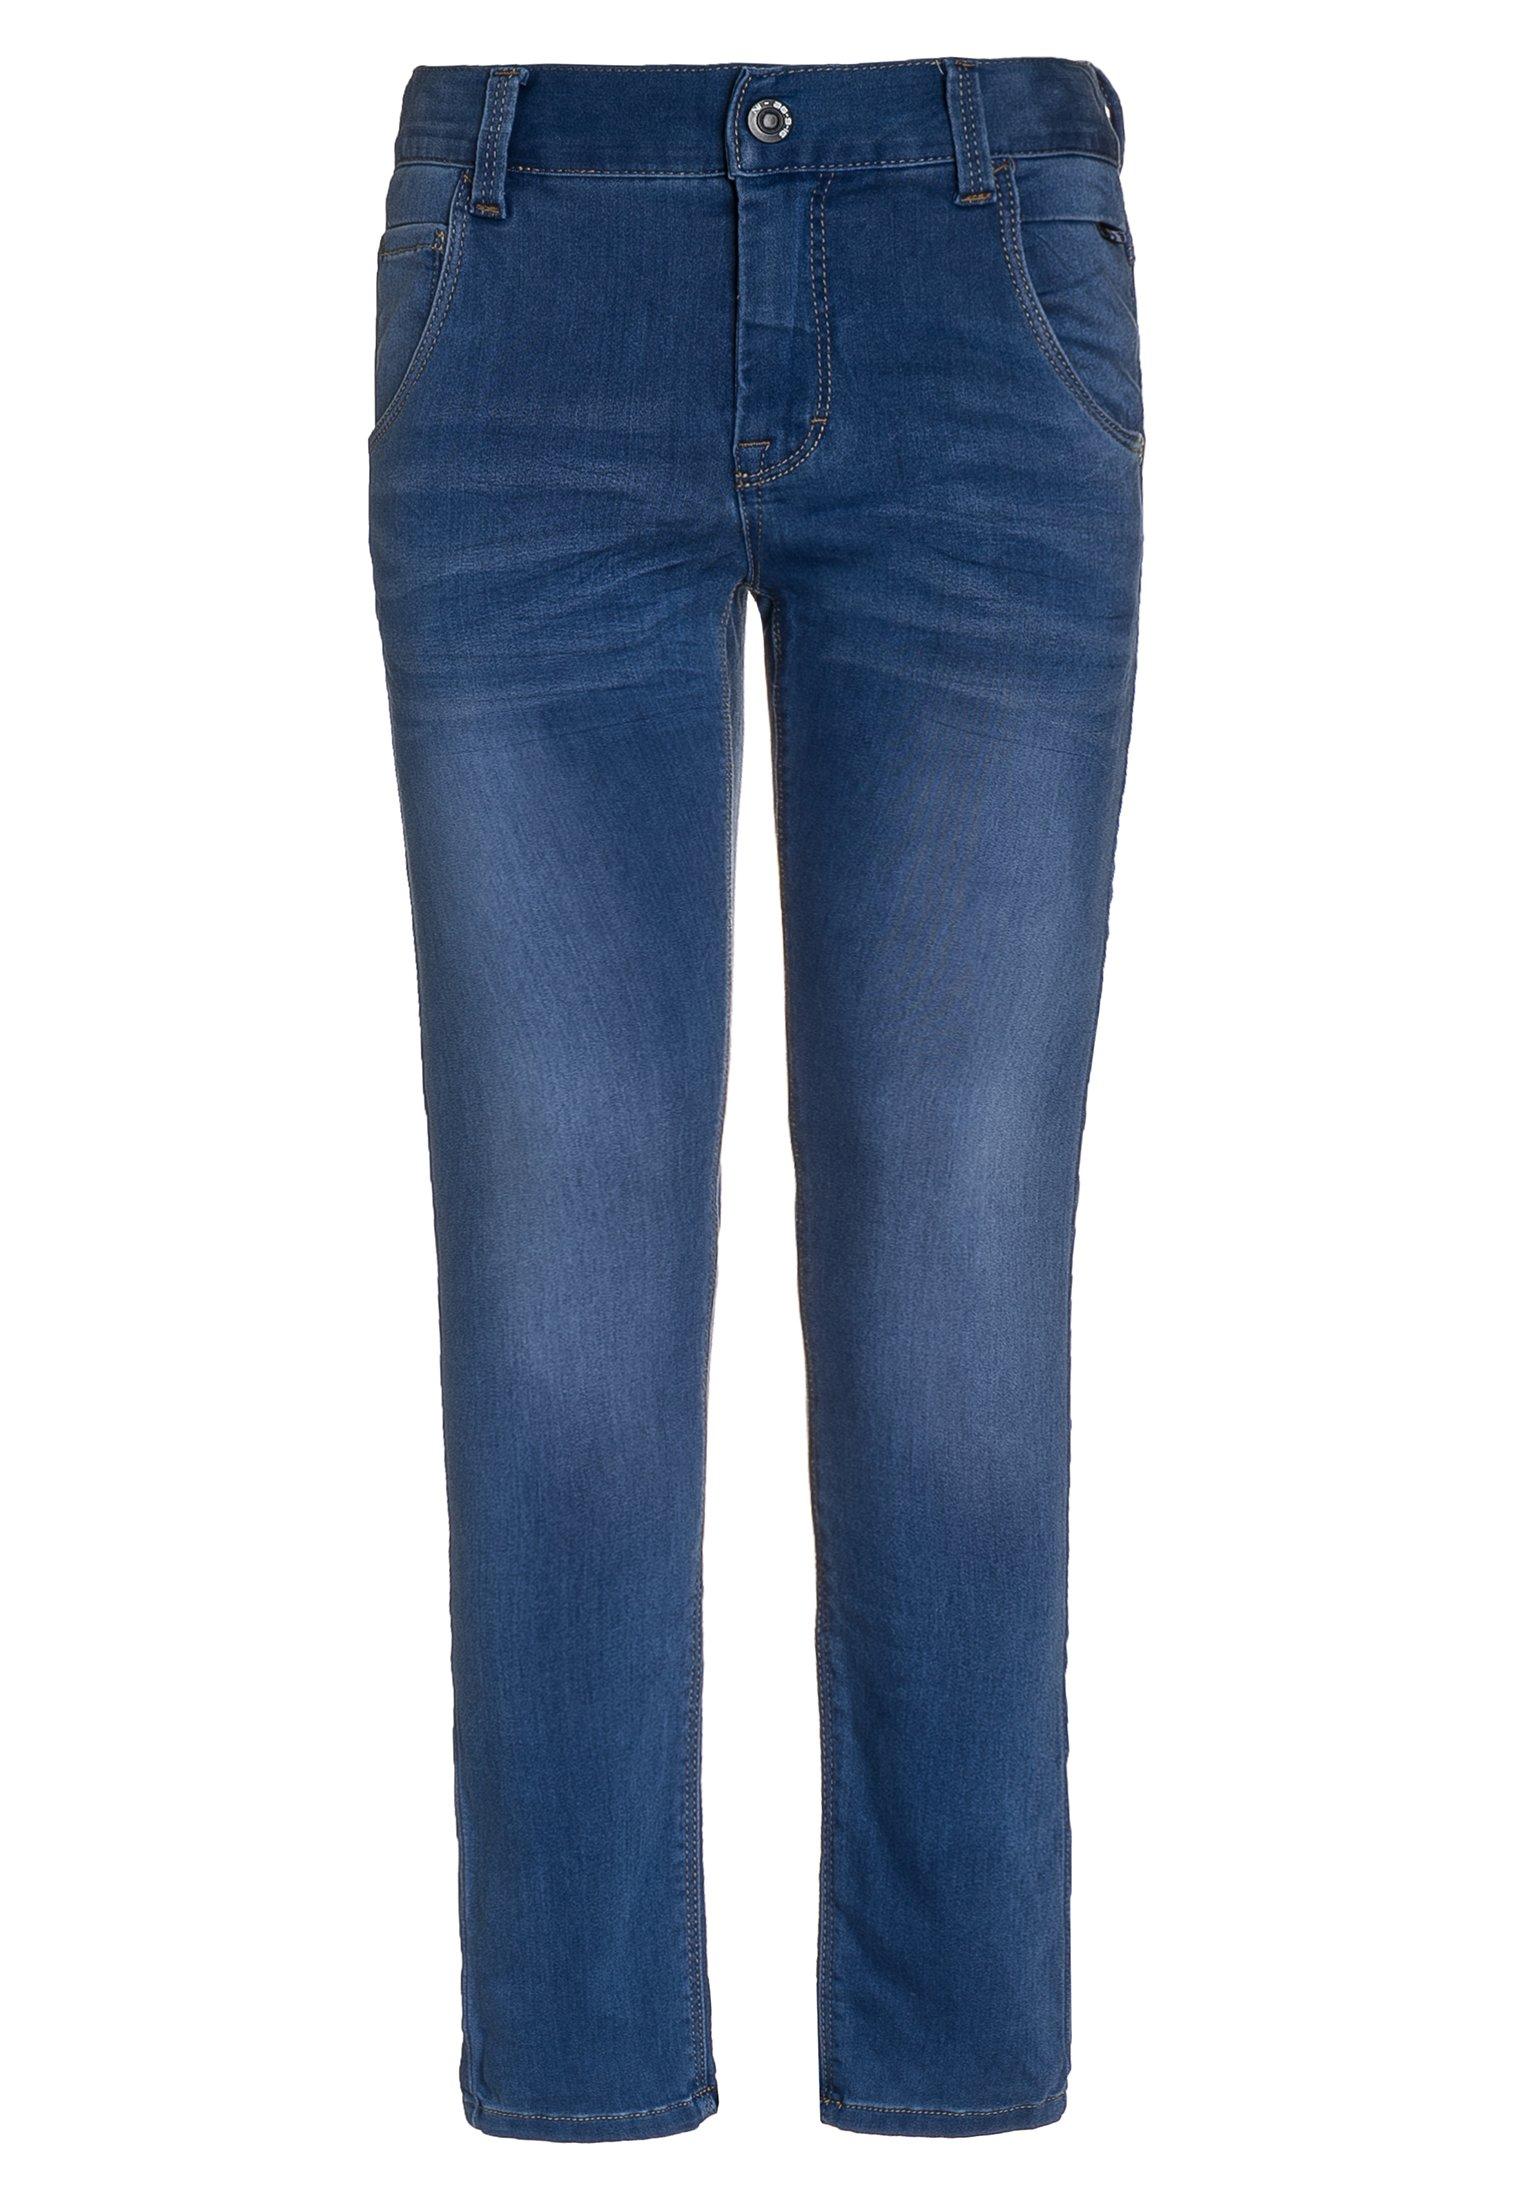 Bambini NITCLAS - Jeans slim fit